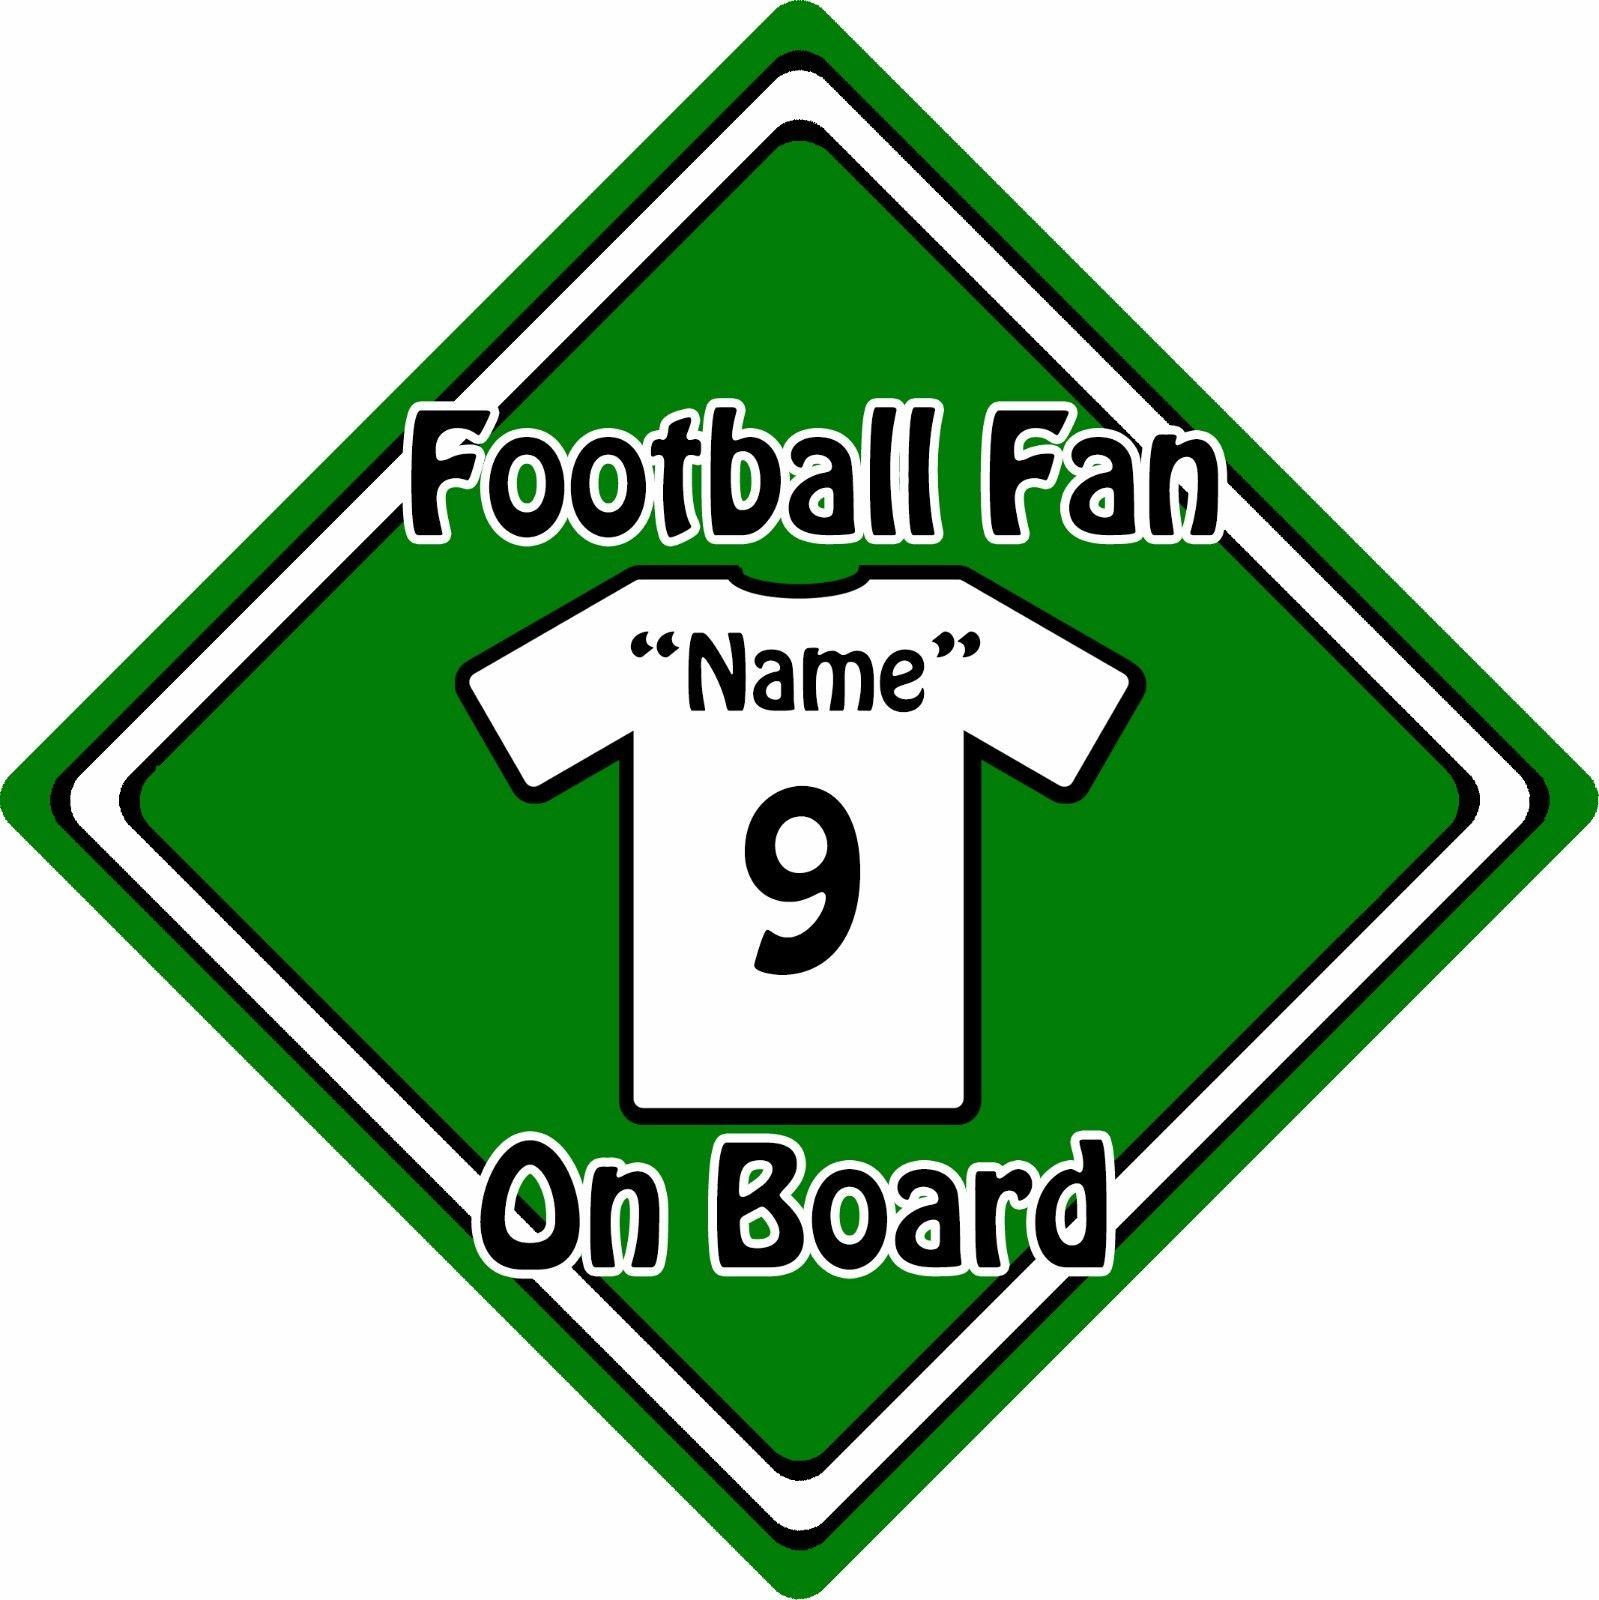 Personalised-Football-Fan-On-Board-Car-Sign-Baby-On-Board-Shirt-Green-152396105912